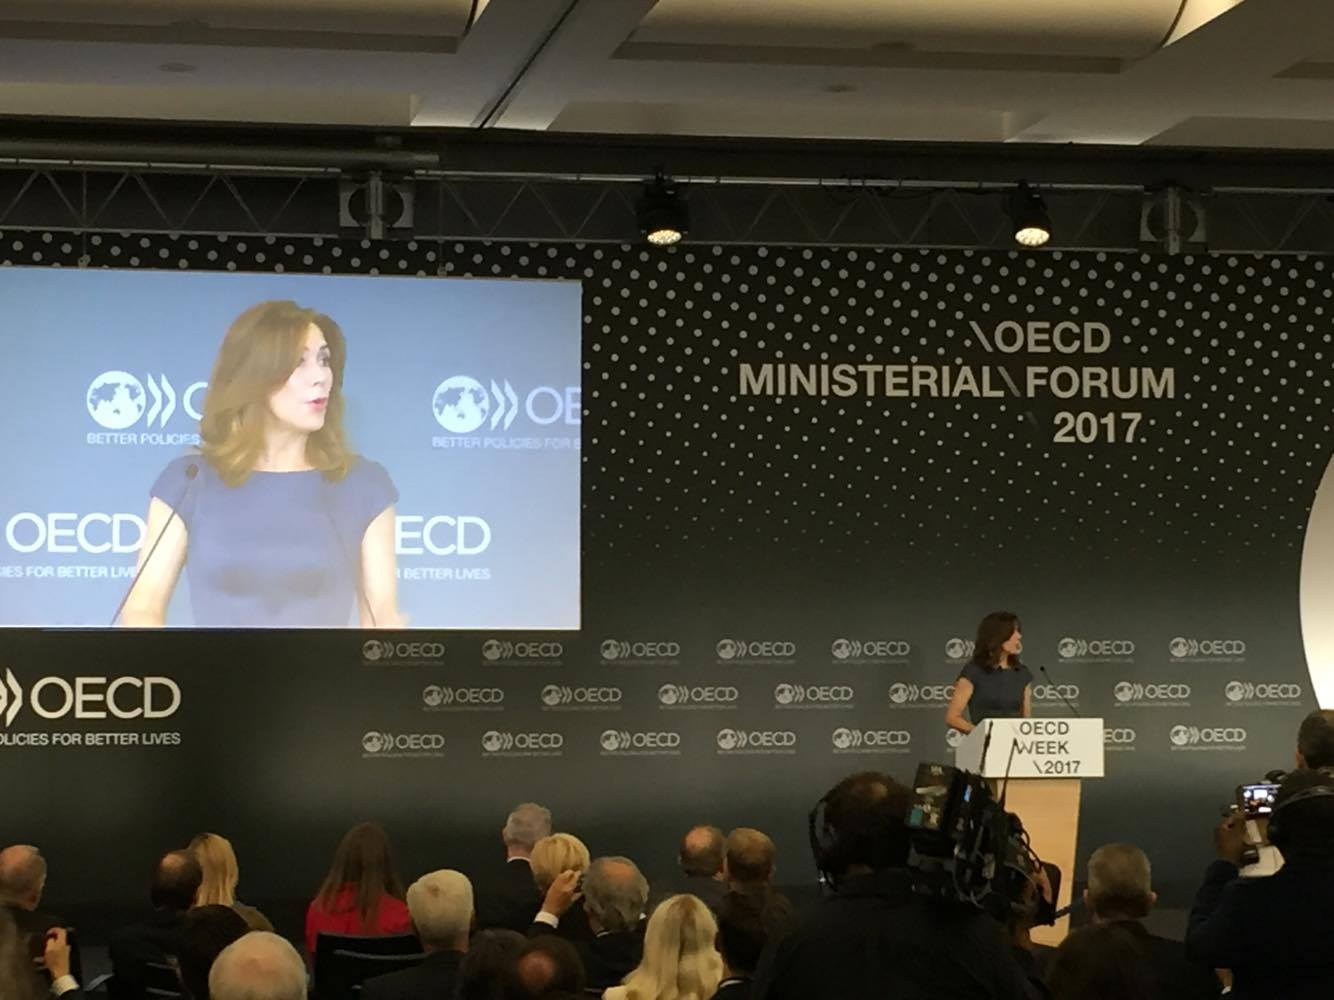 PLENARY SESSION, OECD 2017